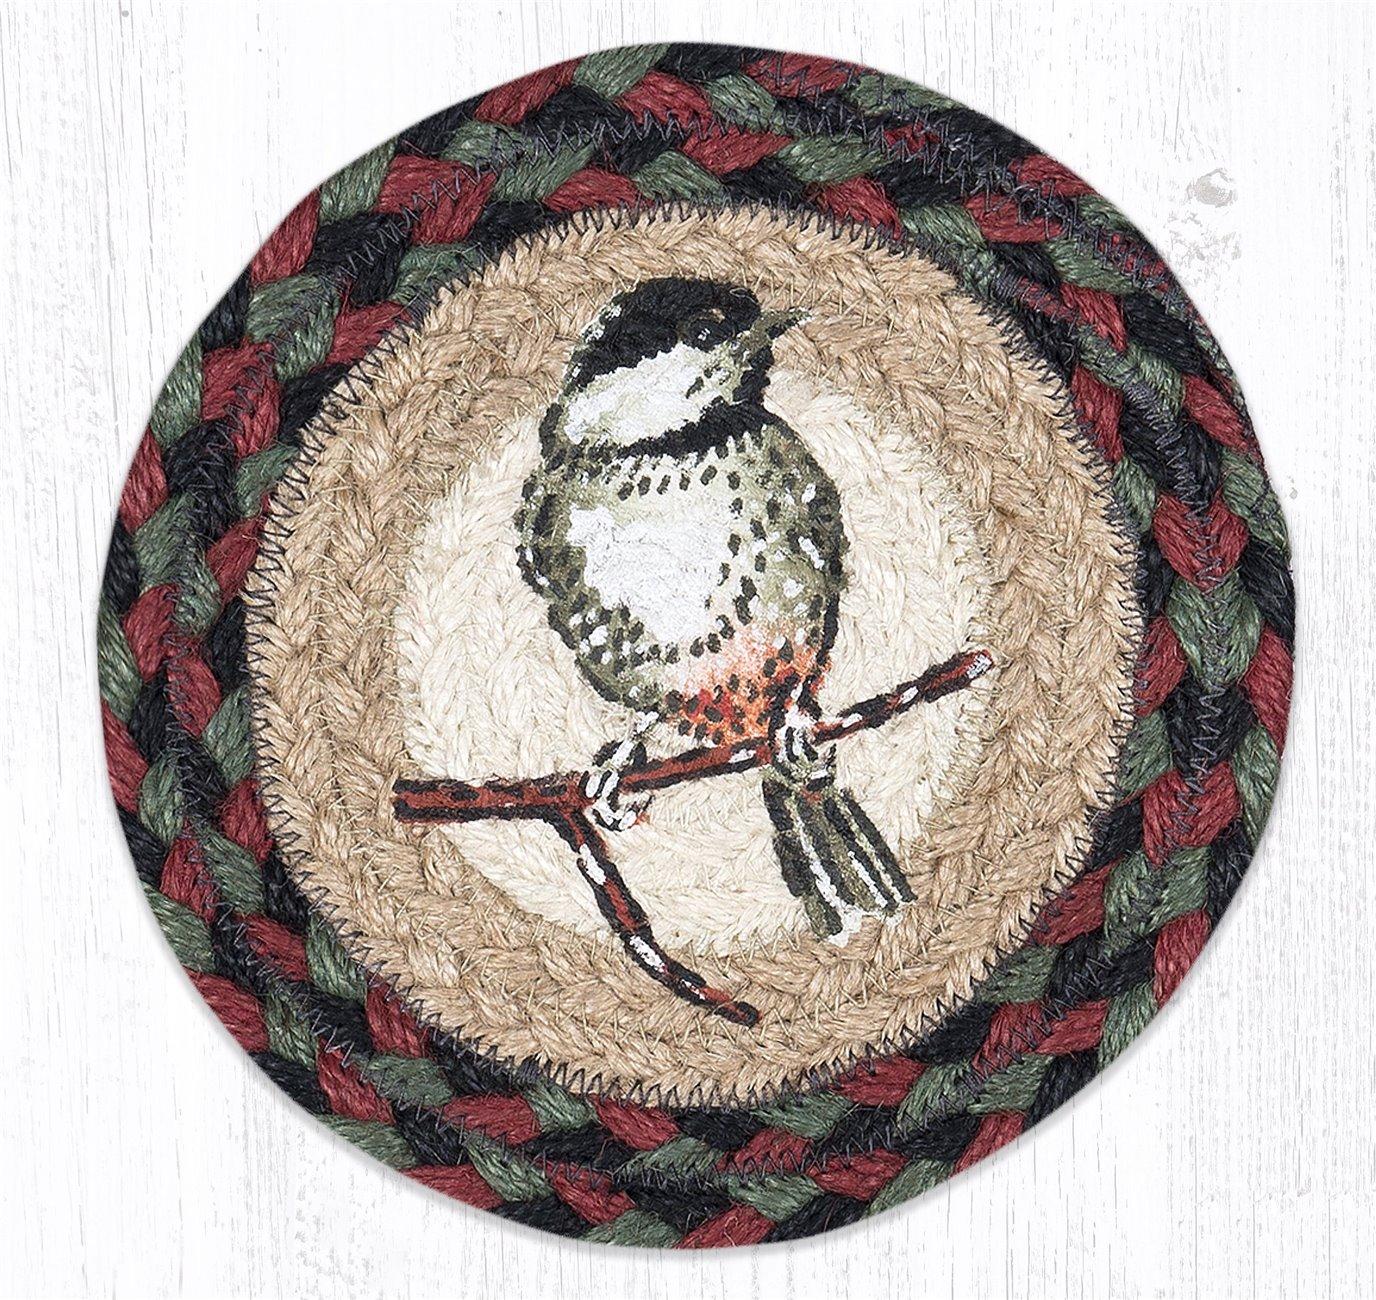 "Chickadee Round Large Braided Coaster 7""x7"" Set of 4"